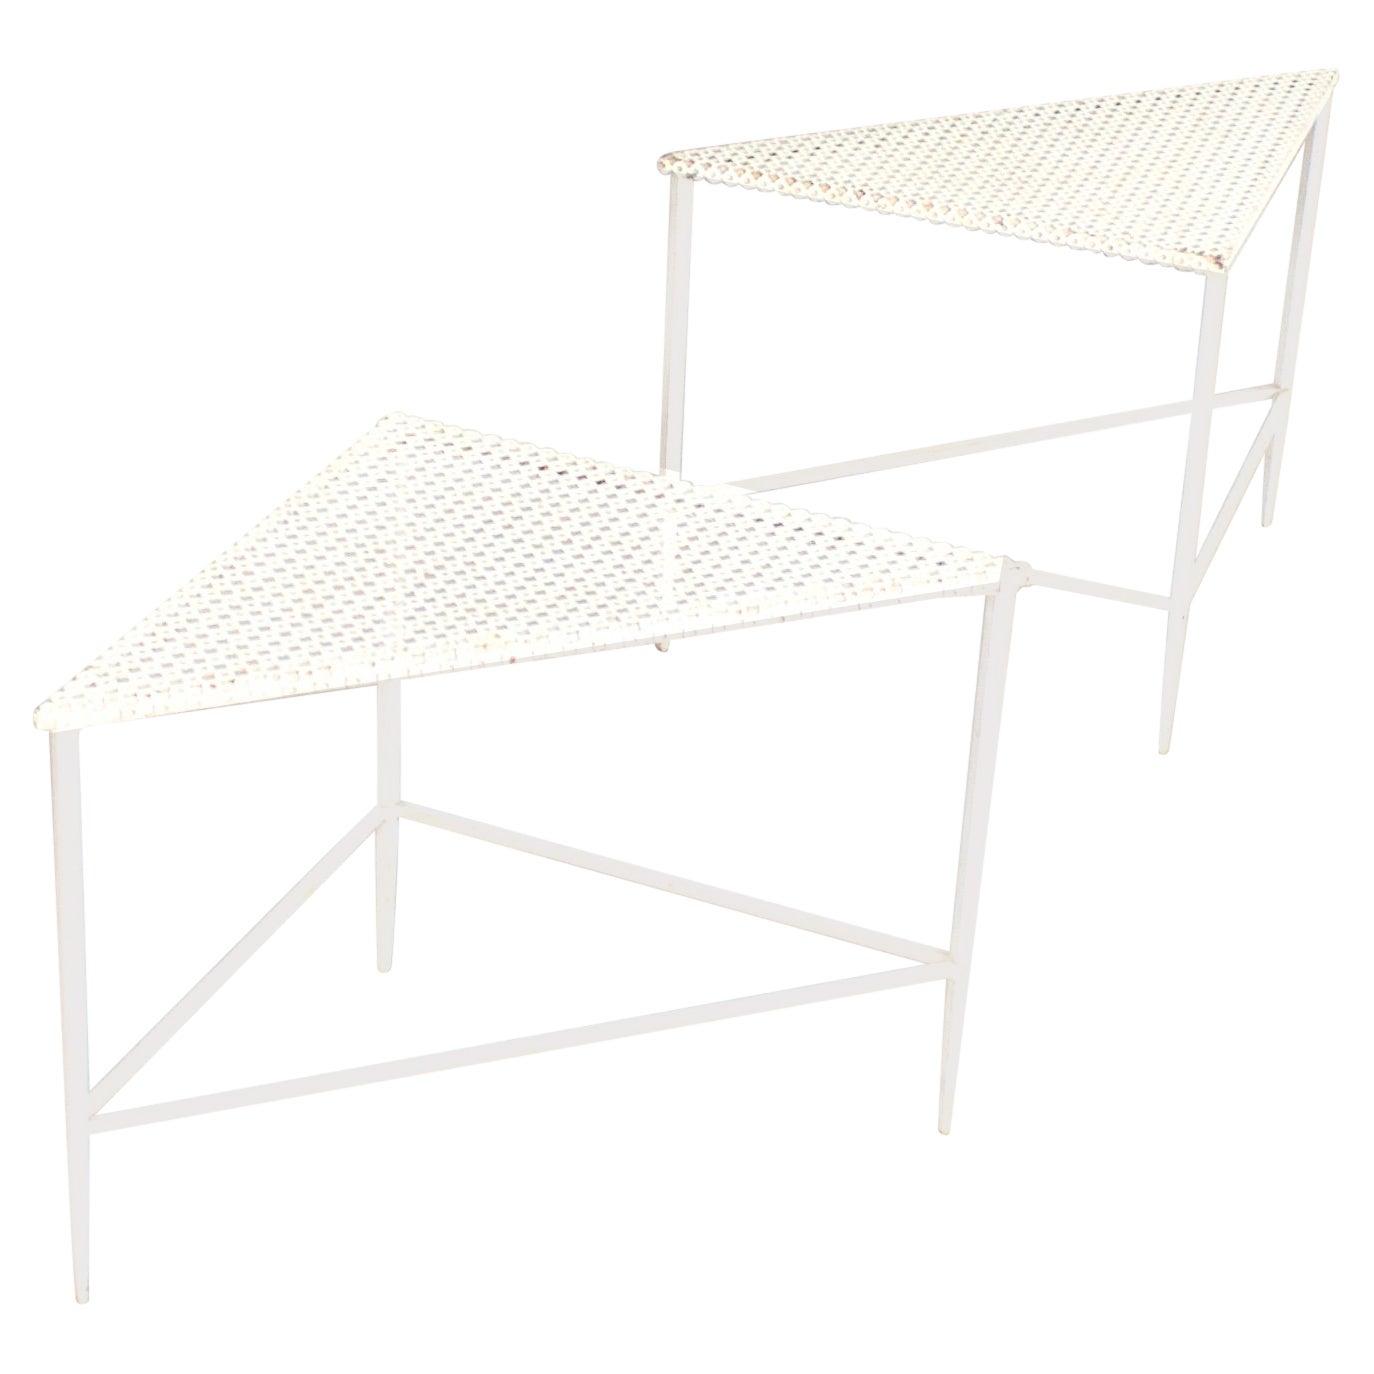 Pair of Triangular Mathieu Matégot Tables for Artimeta in White, 1950s